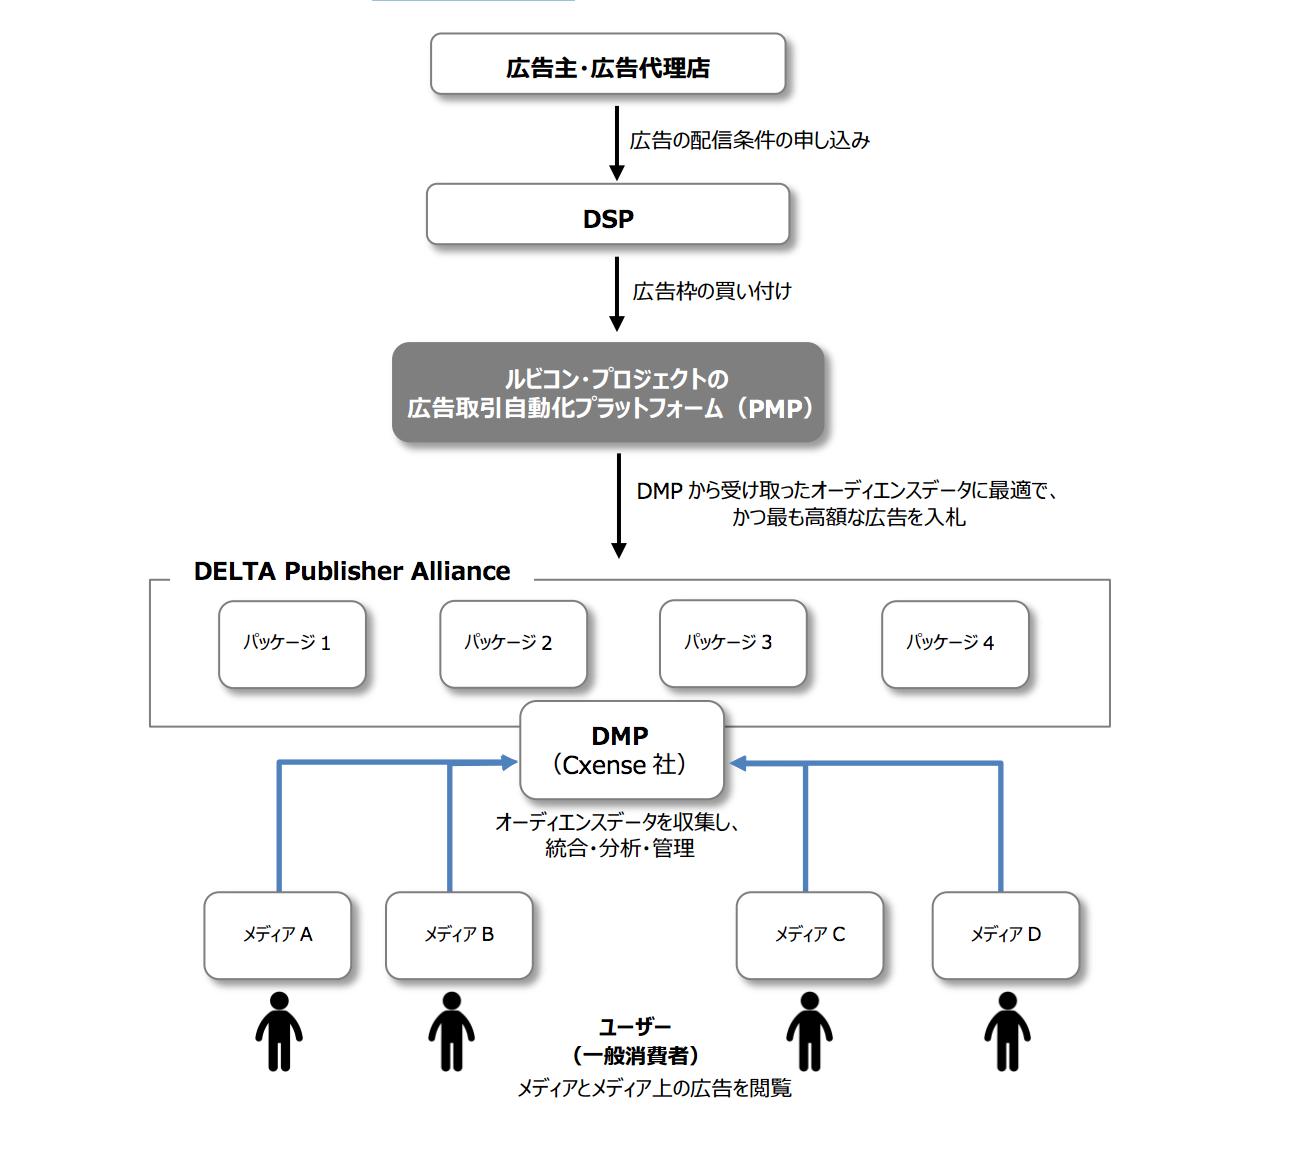 DELTA Publisher Alliance の広告売買の流れ